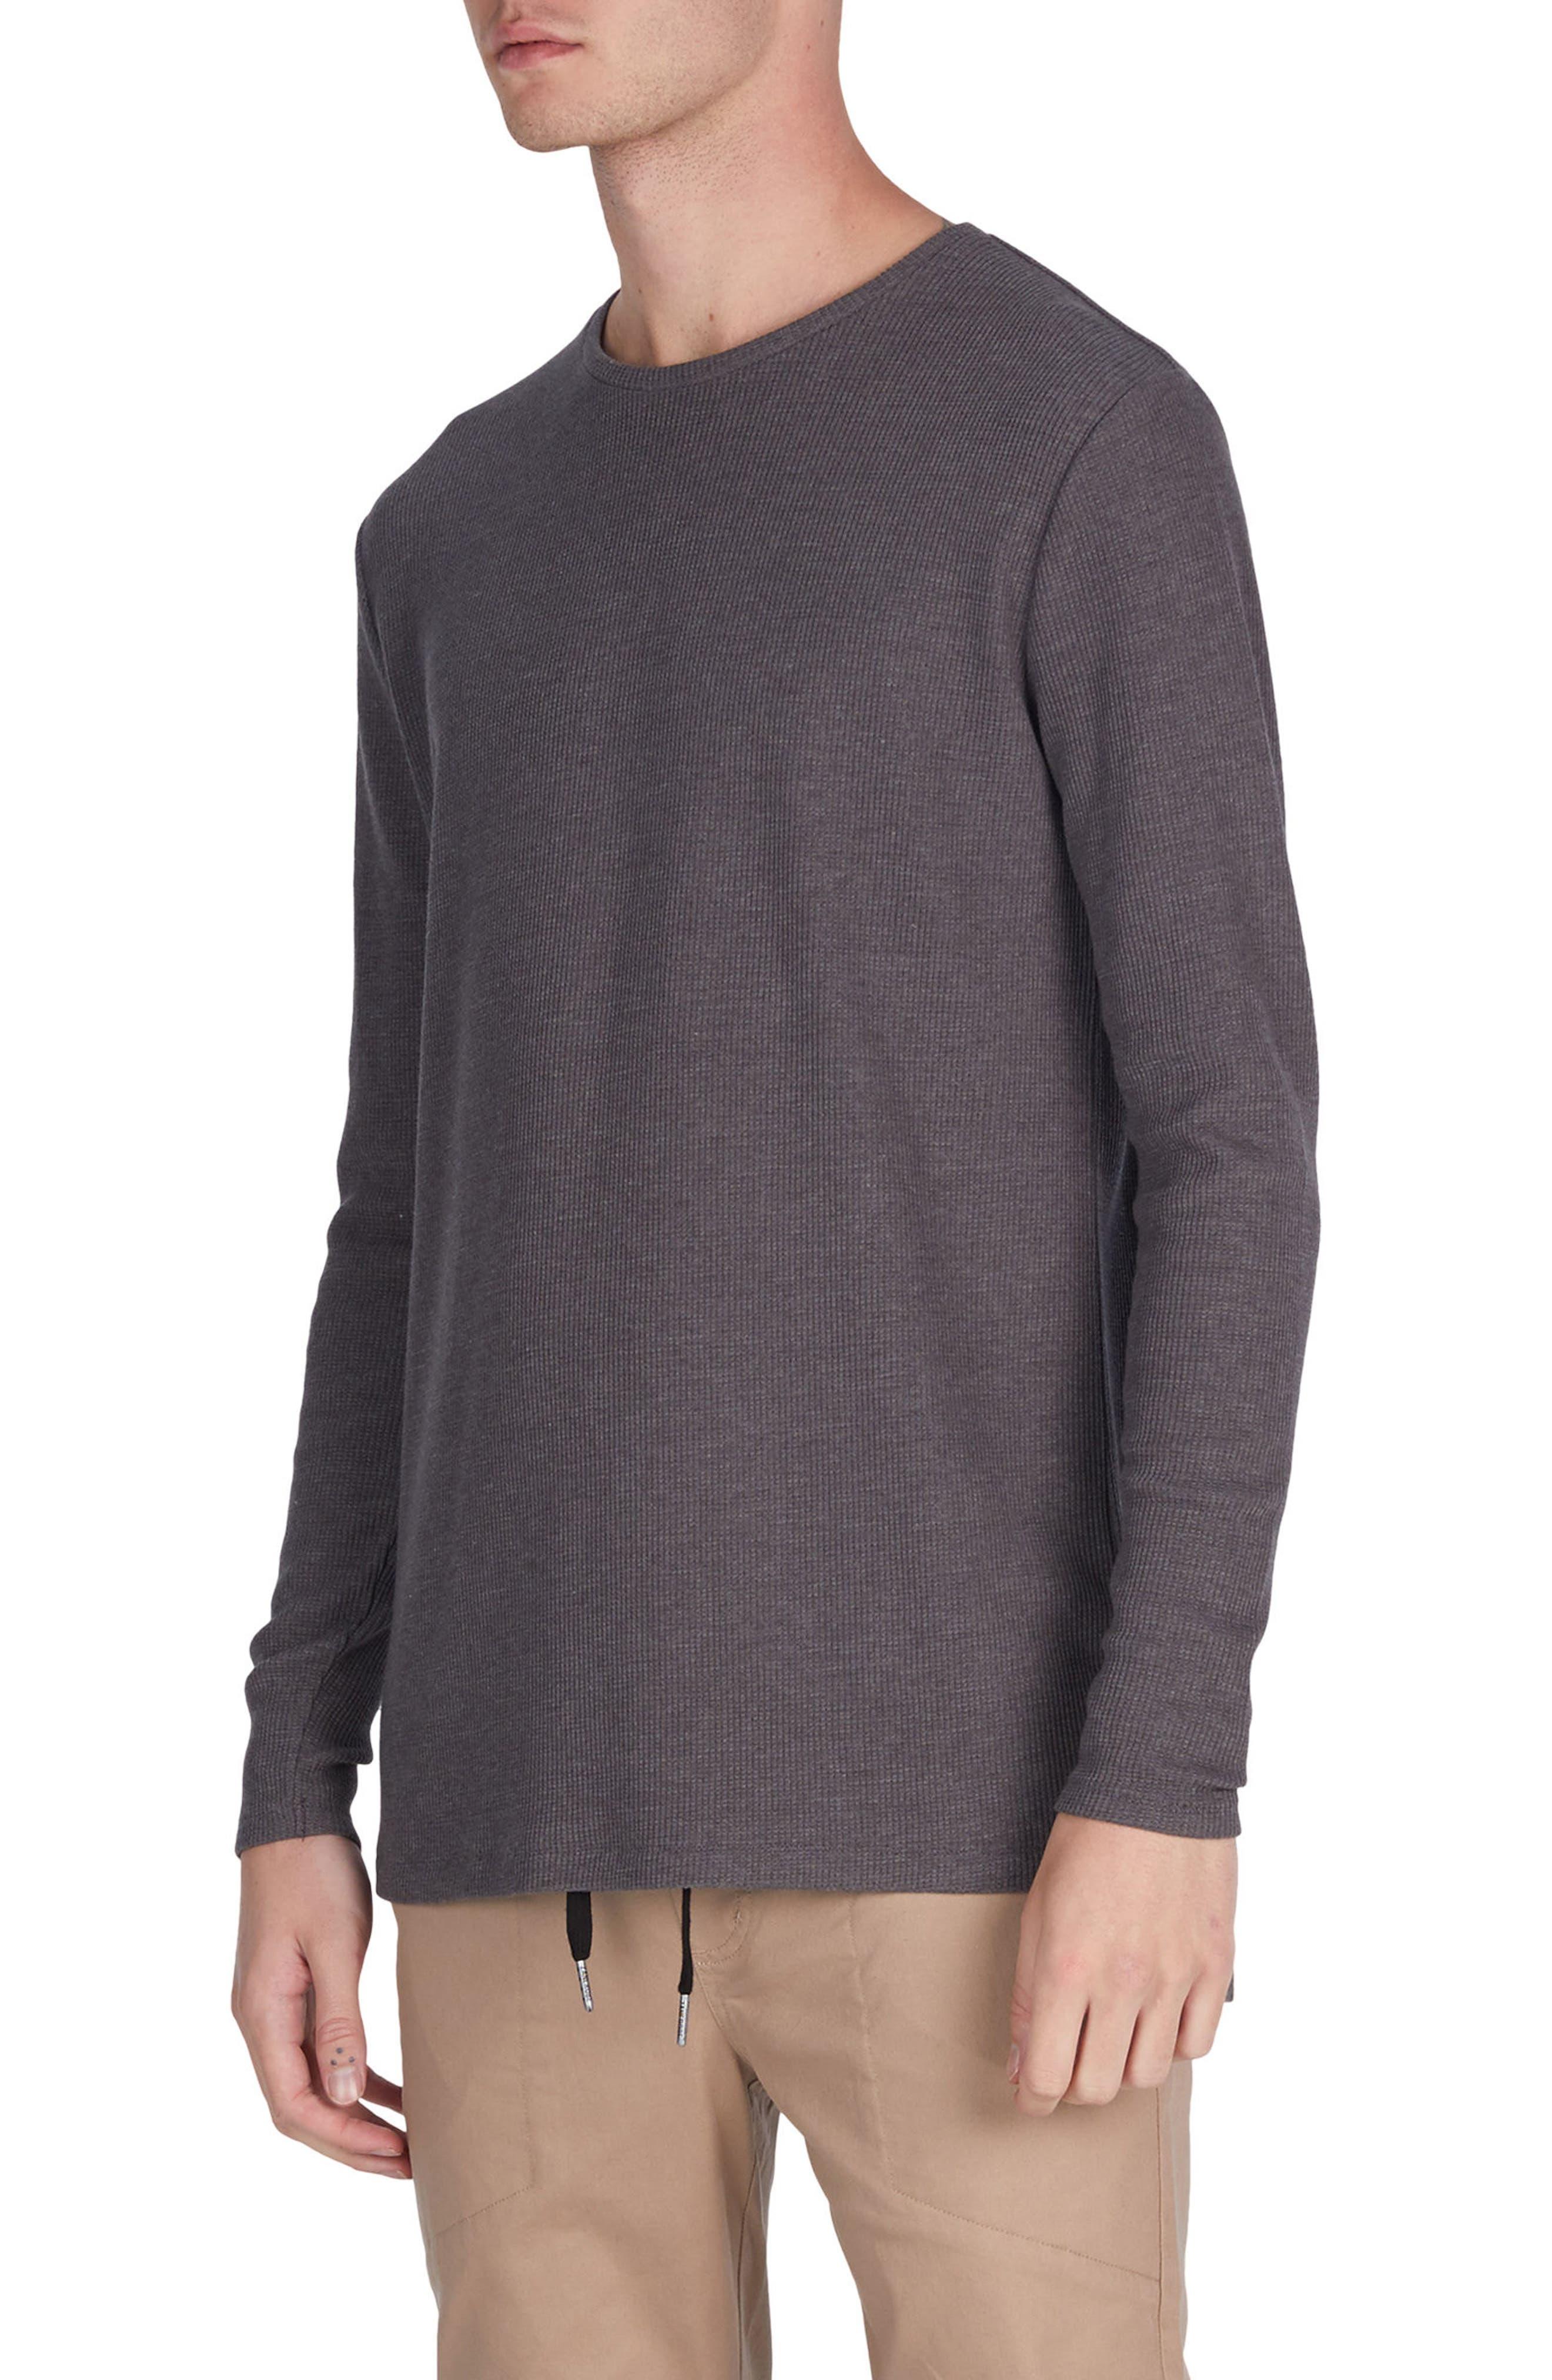 Flintlock Thermal T-Shirt,                             Alternate thumbnail 4, color,                             021